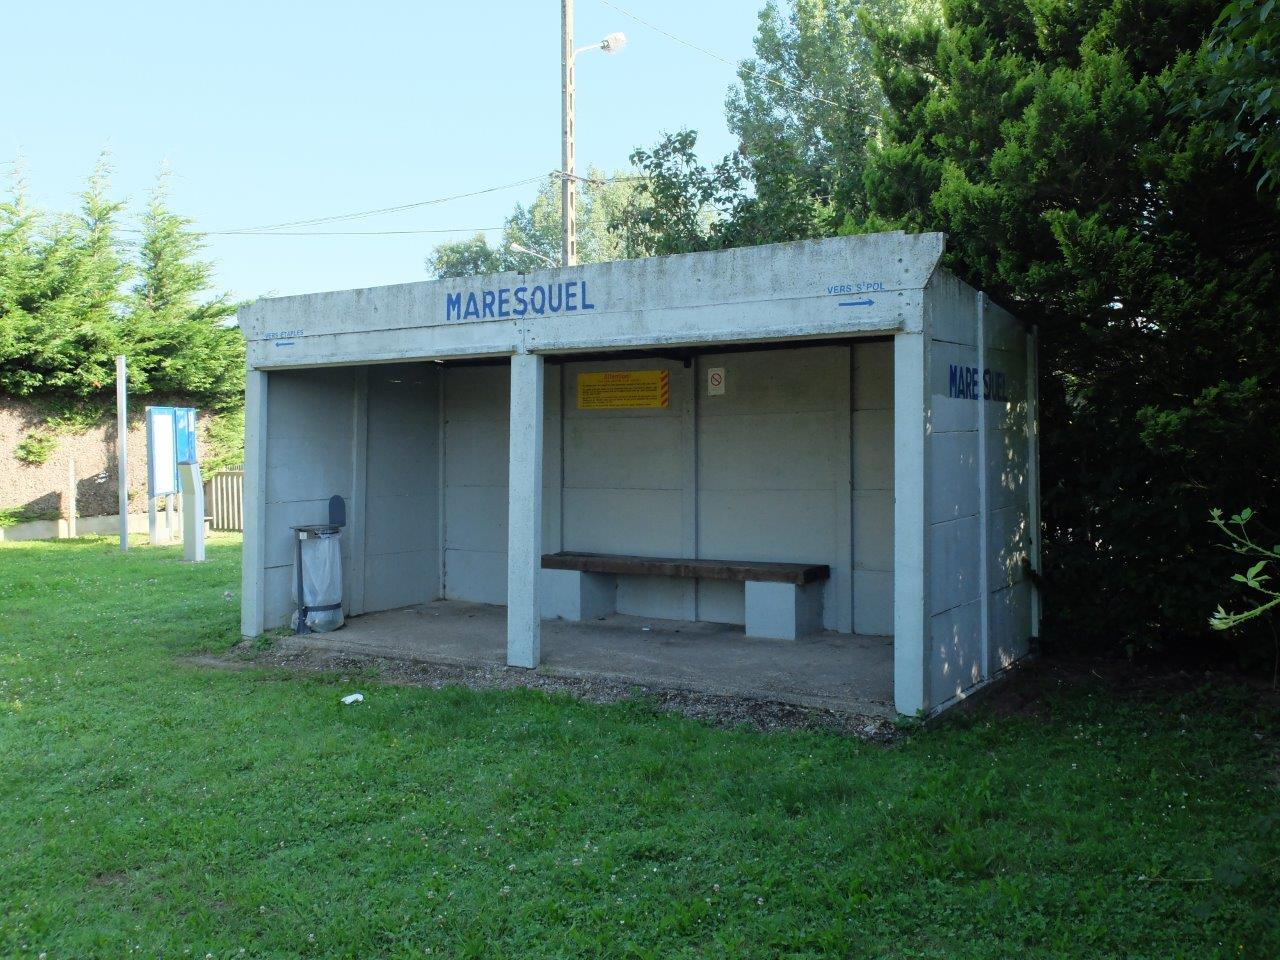 gare-de-maresquel-train-station